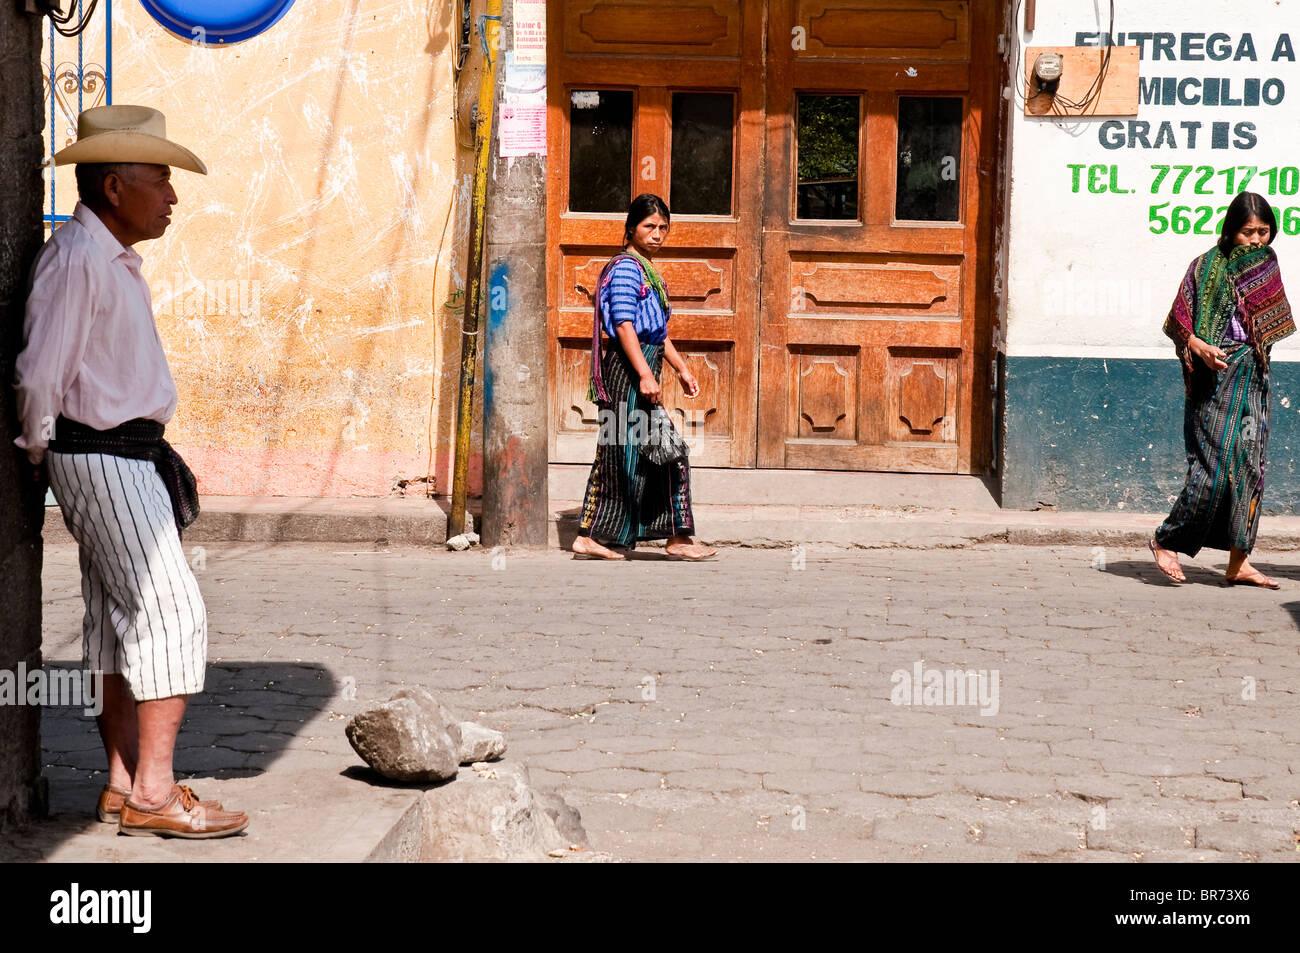 Santiago Atitlan street ambiance, in the atitlan lake region, Guatemala. - Stock Image